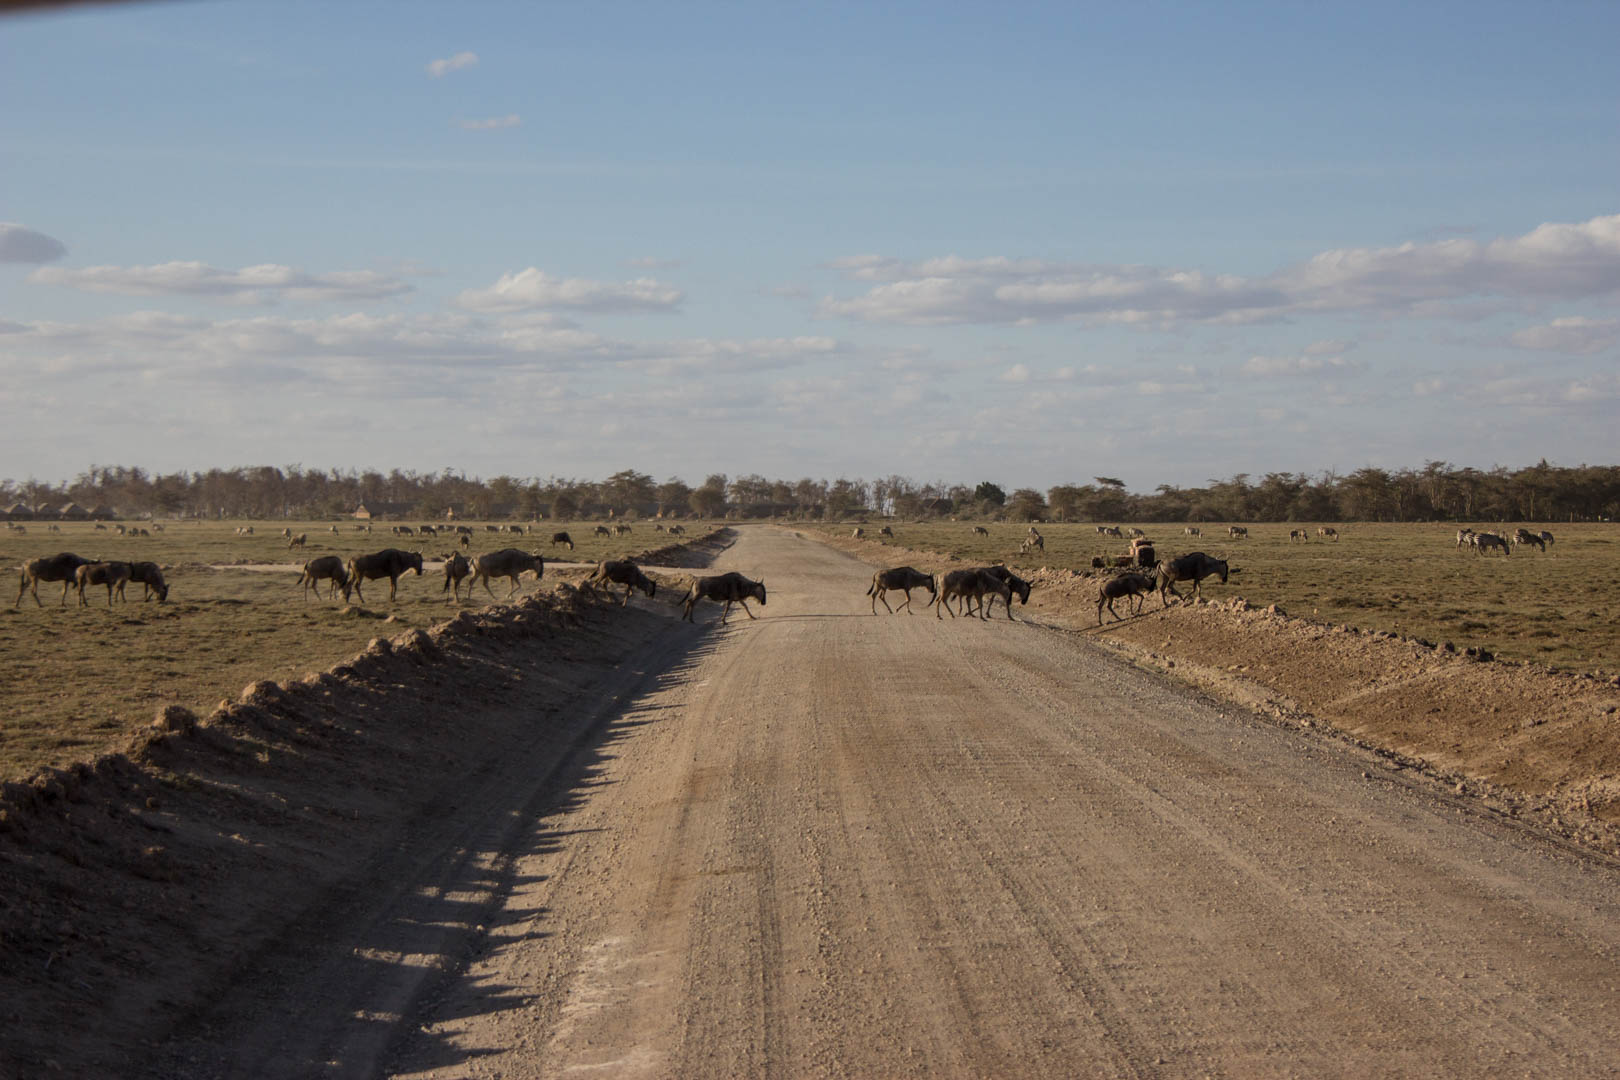 Ñus, Parque Nacional de Amboseli, Kenia